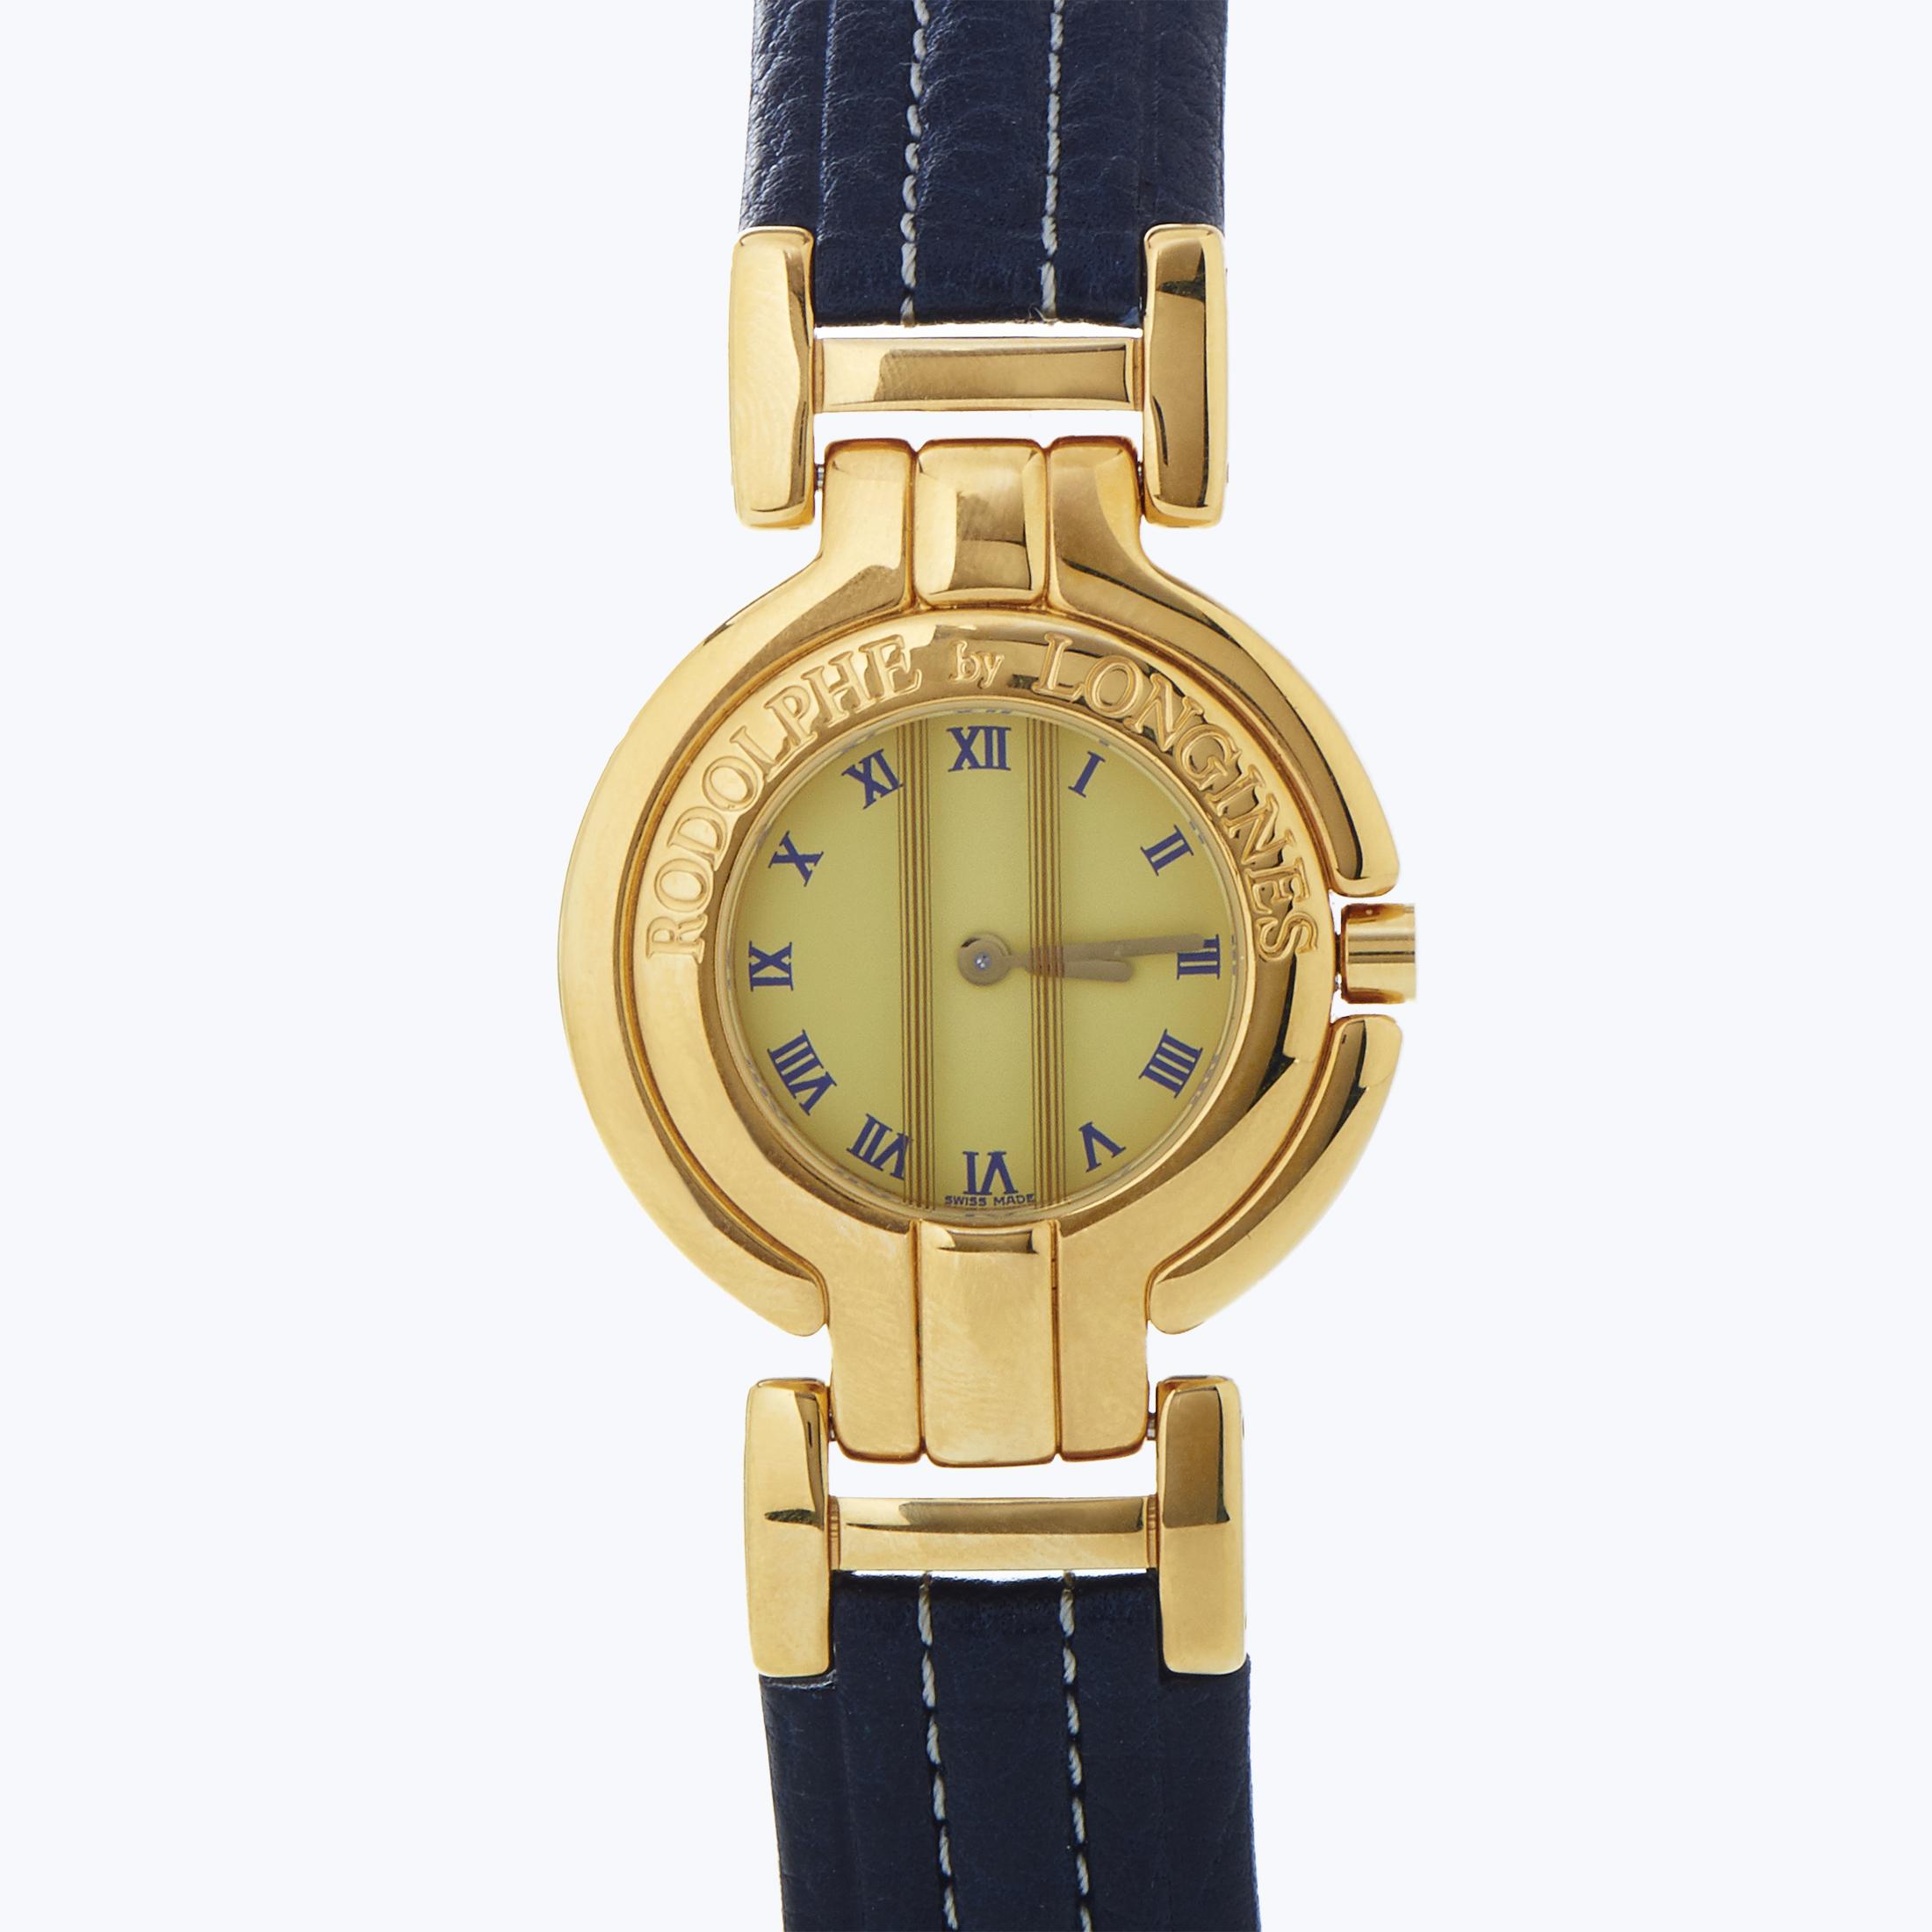 Rodolphe Women's Gold Plated Quartz Watch L4.292.7.91.3